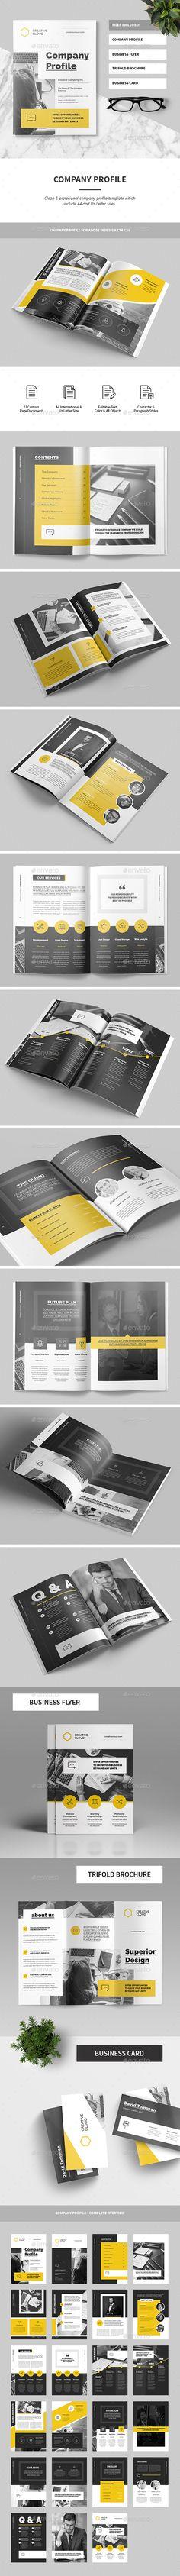 The Company Profile | Company profile, Brochure template and Brochures